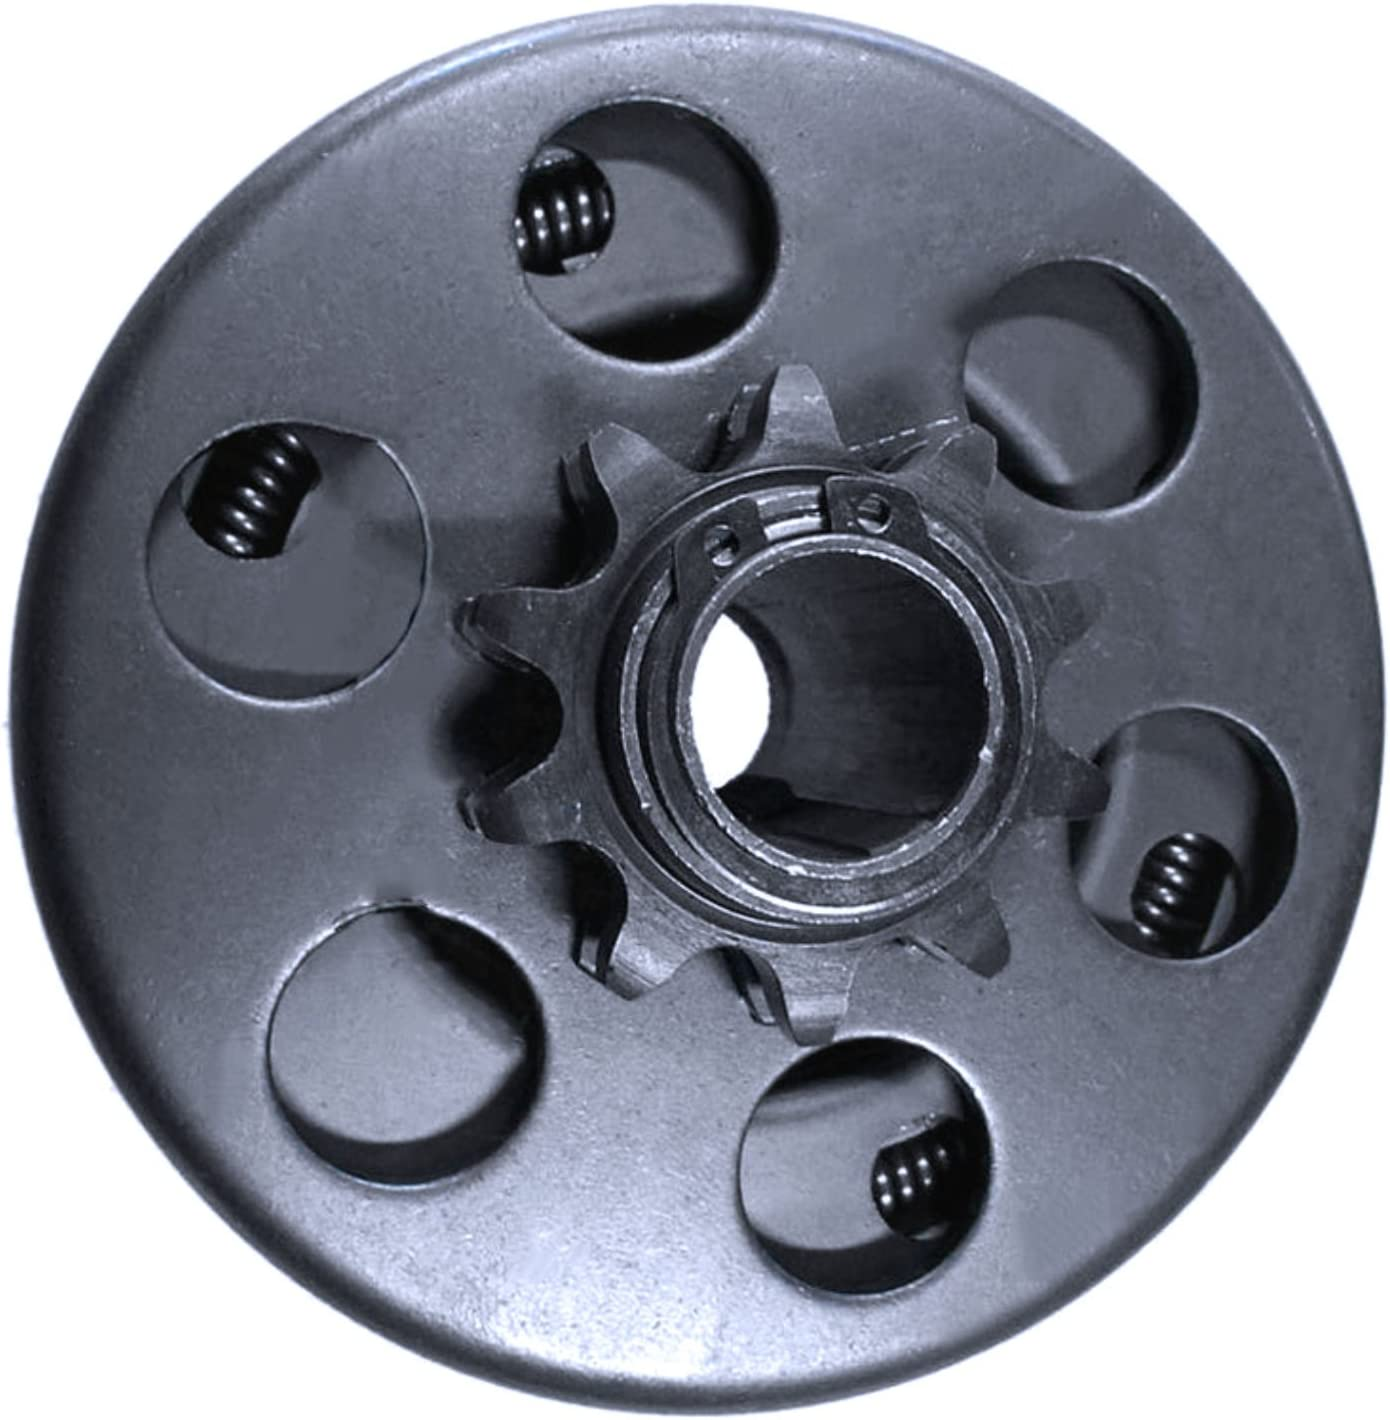 Bravex Centrifugal Clutch 10T 3//4 BORE Chain #40//41//420 for Mini Bike Honda Engines Go Kart Fun Kart 10 Tooth